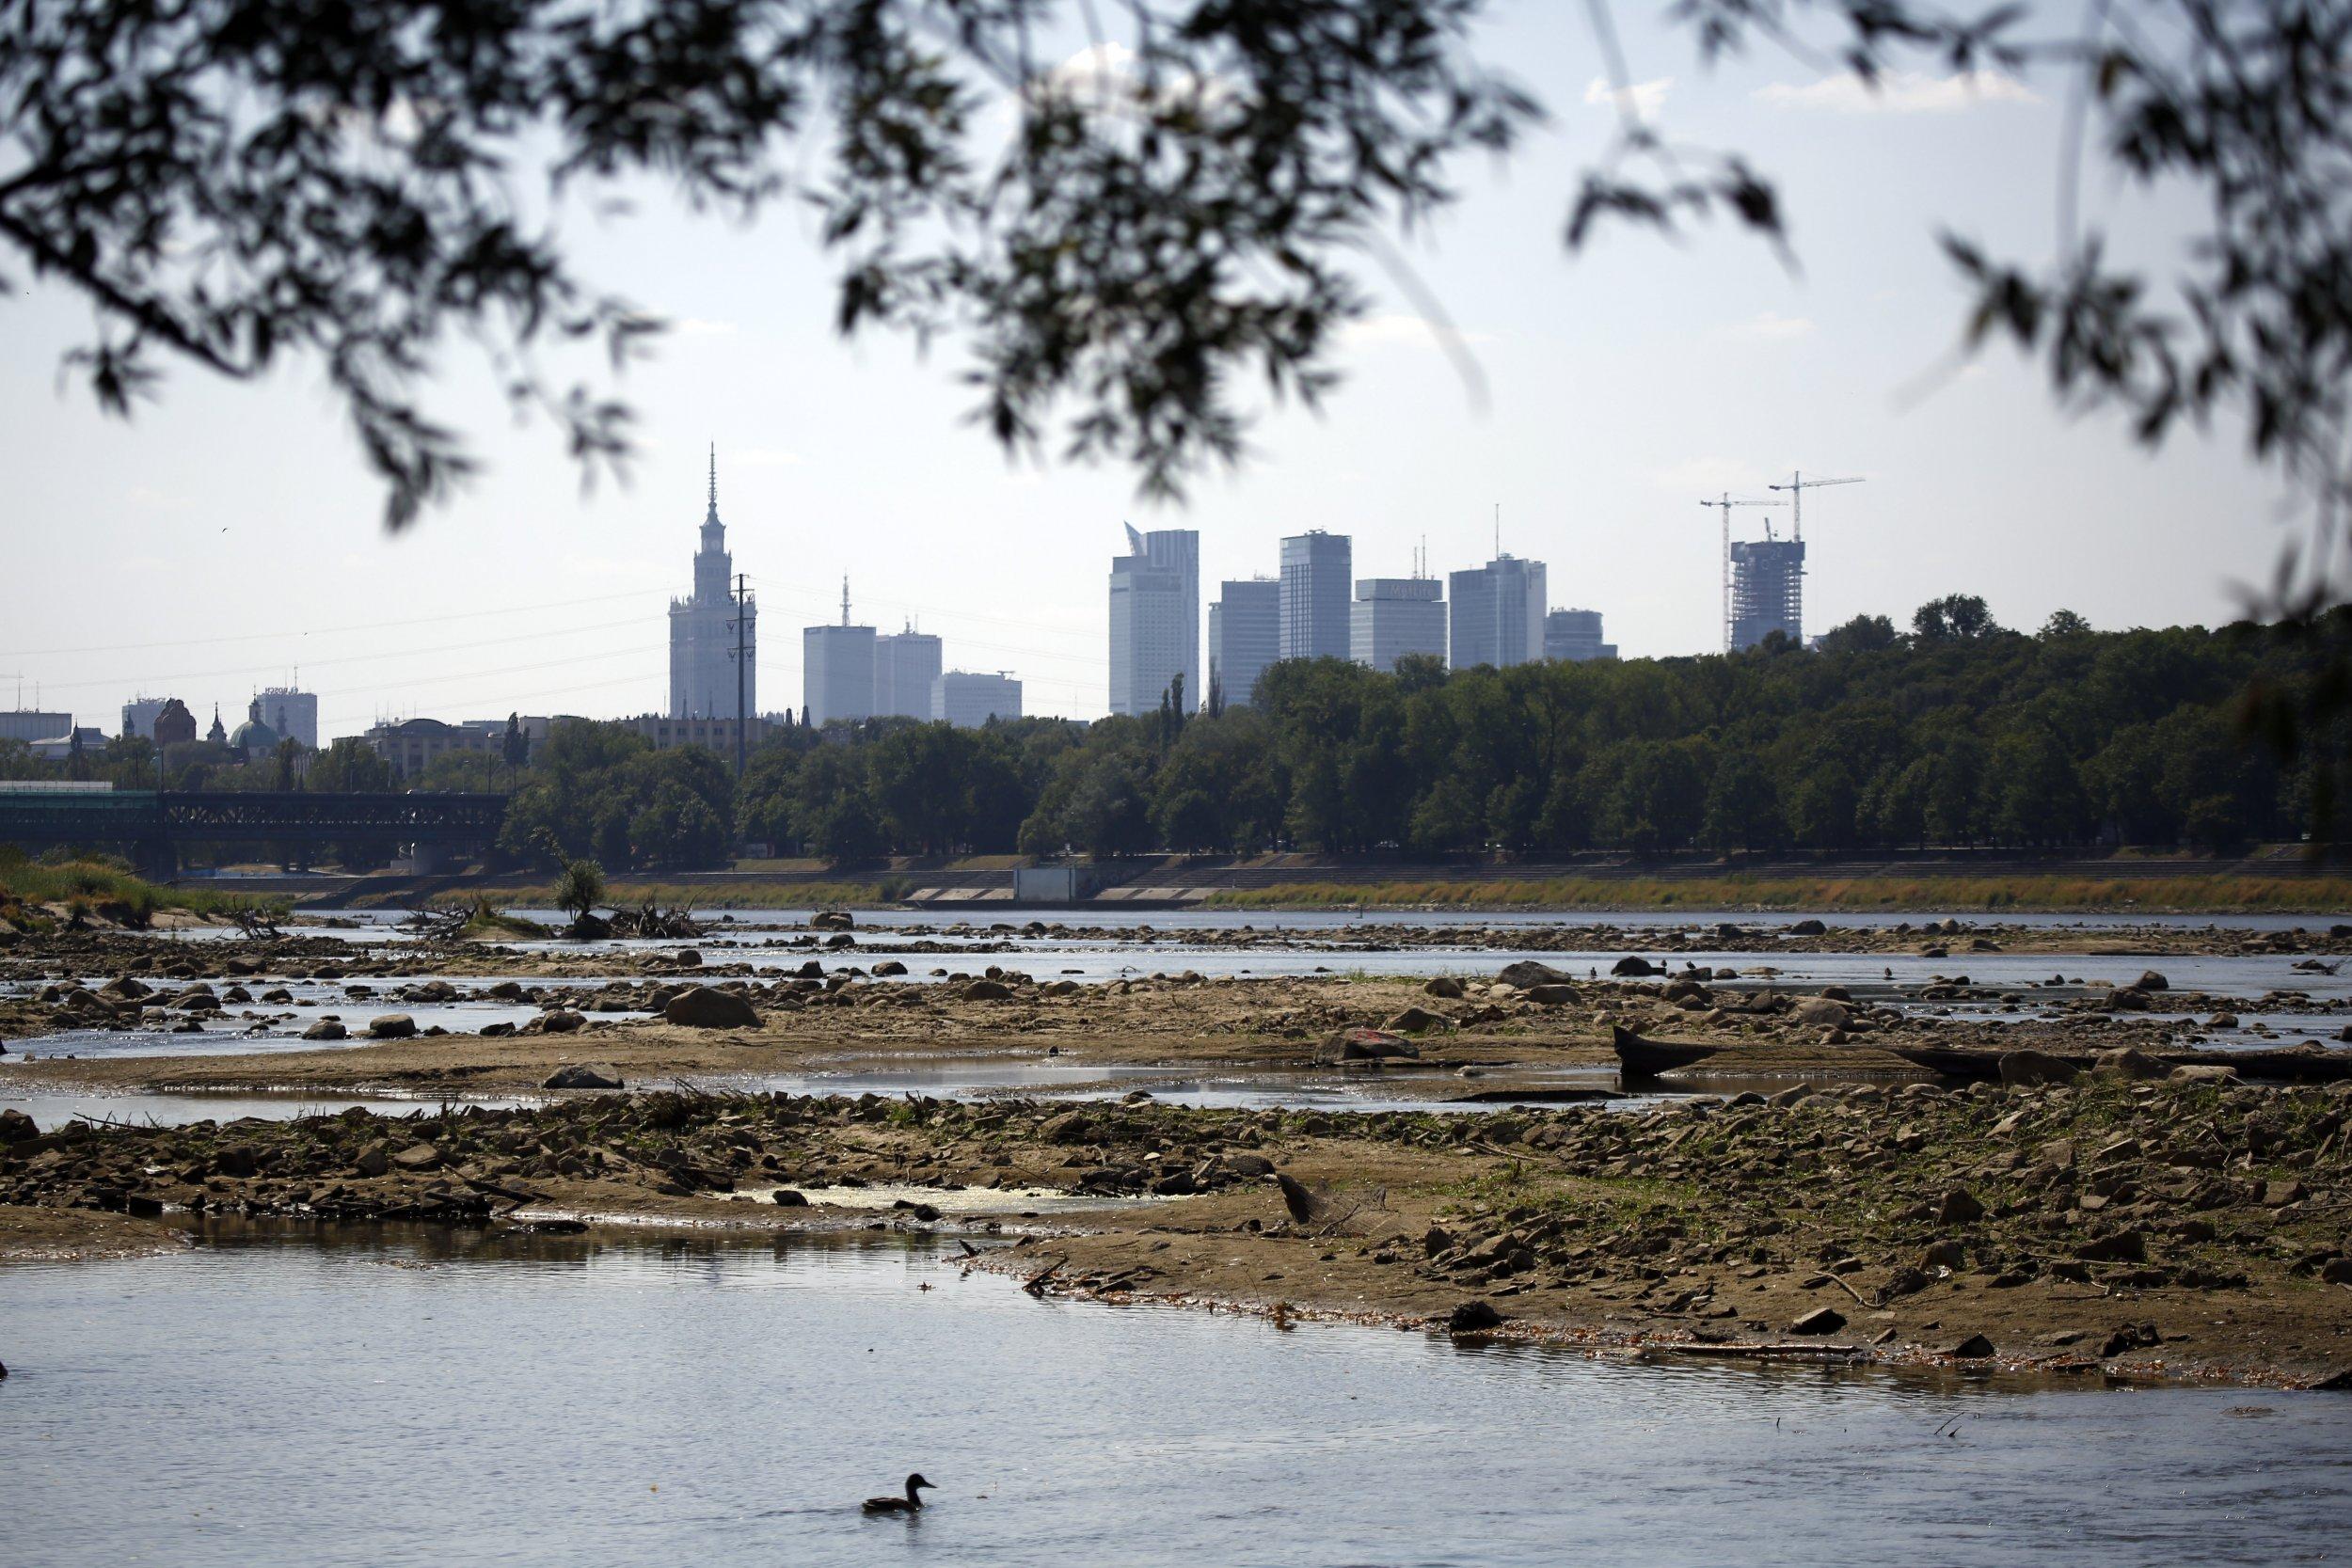 8-28-15 Vistula River